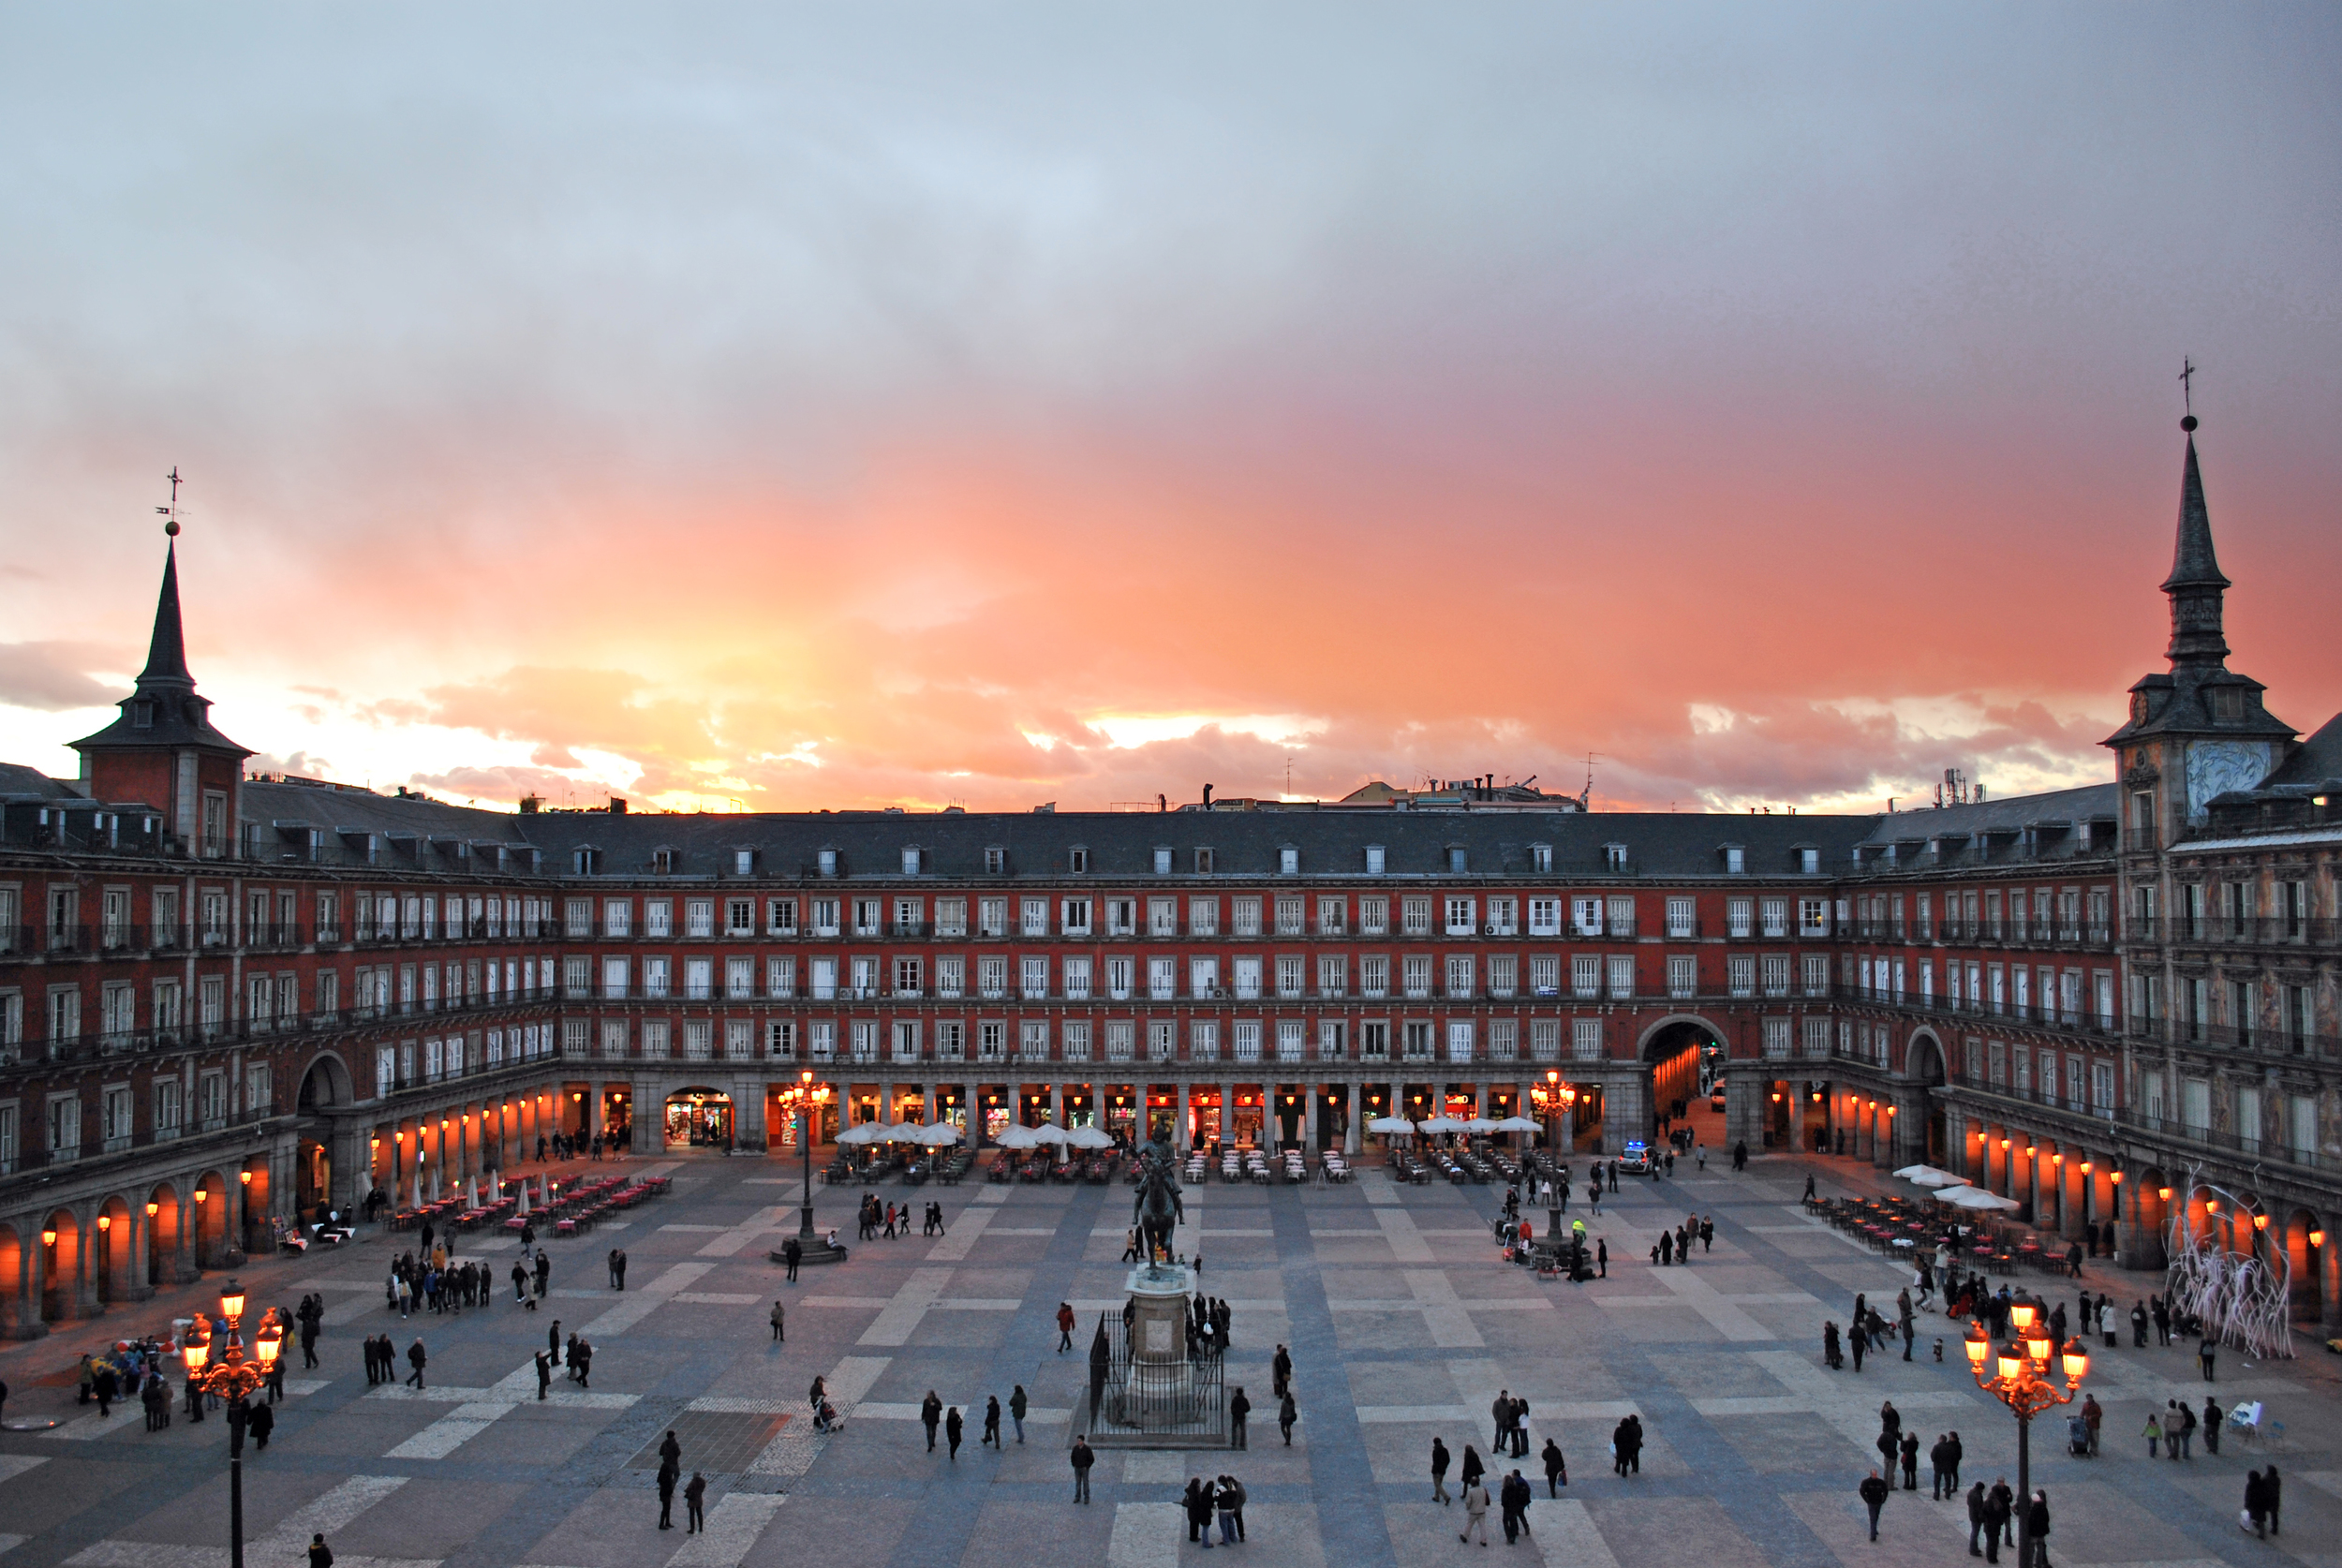 Plaza_Mayor_de_Madrid_02.jpg